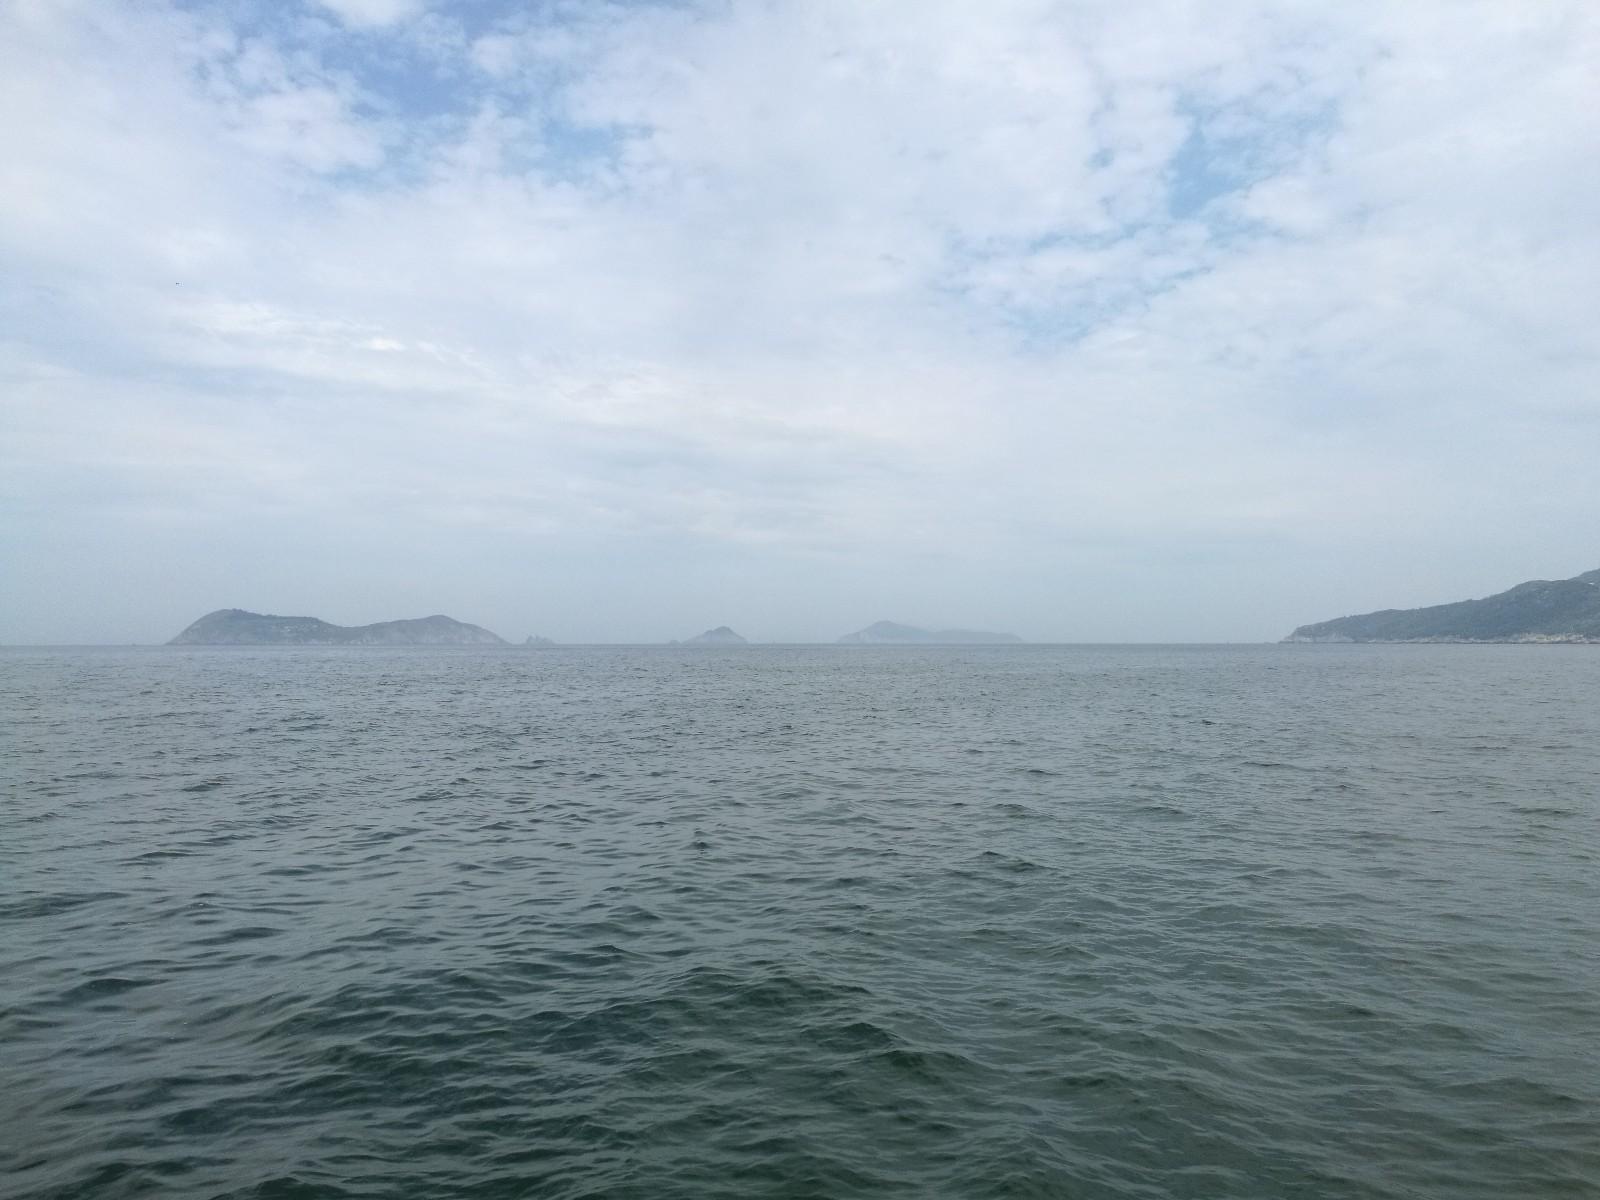 nbsp,岛屿,只能,一样,海域 真正的历练才刚刚开始,航海就是挑战自己——唐山号返航记(中篇)  102937a81wxe4t